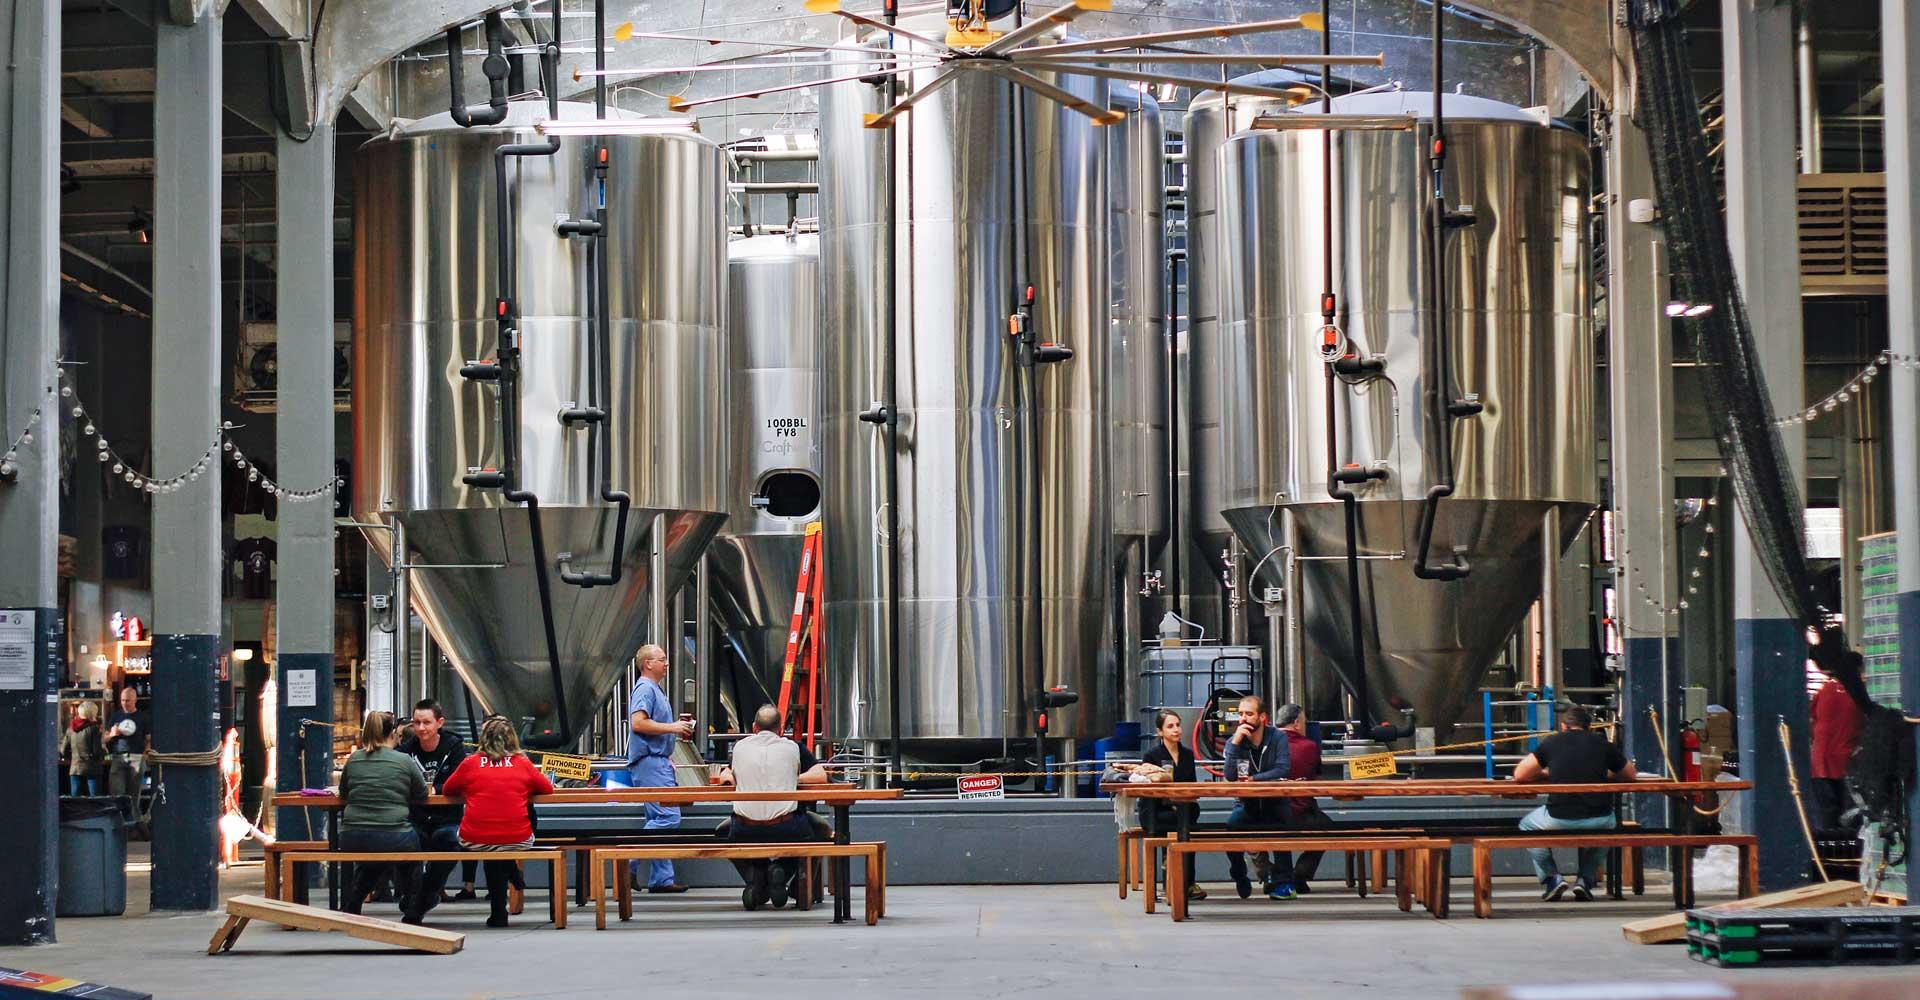 Beercation cincinnati ohio craft beer brewing magazine for Minnesota craft beer festival